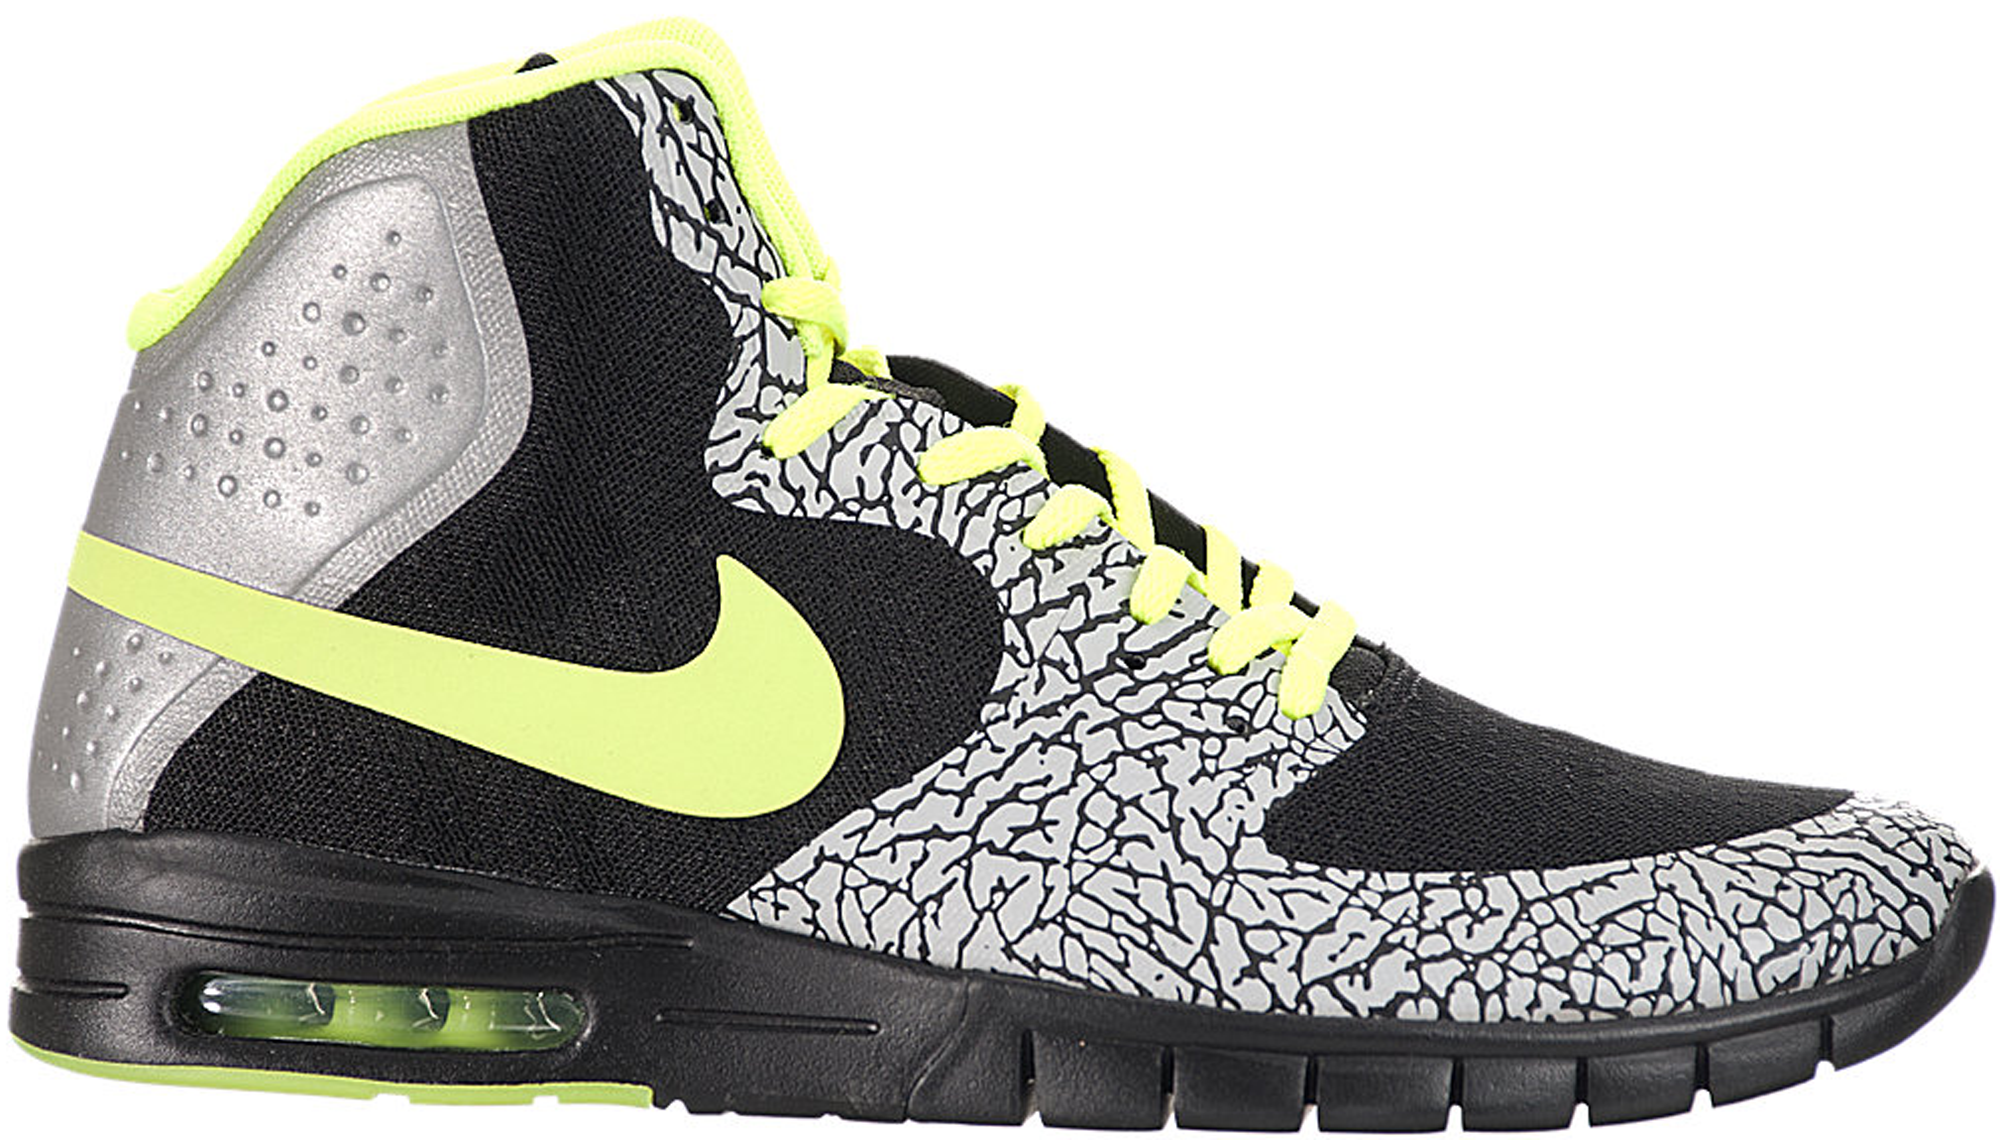 Nike SB Paul Rodriguez Hyperfuse Max DJ